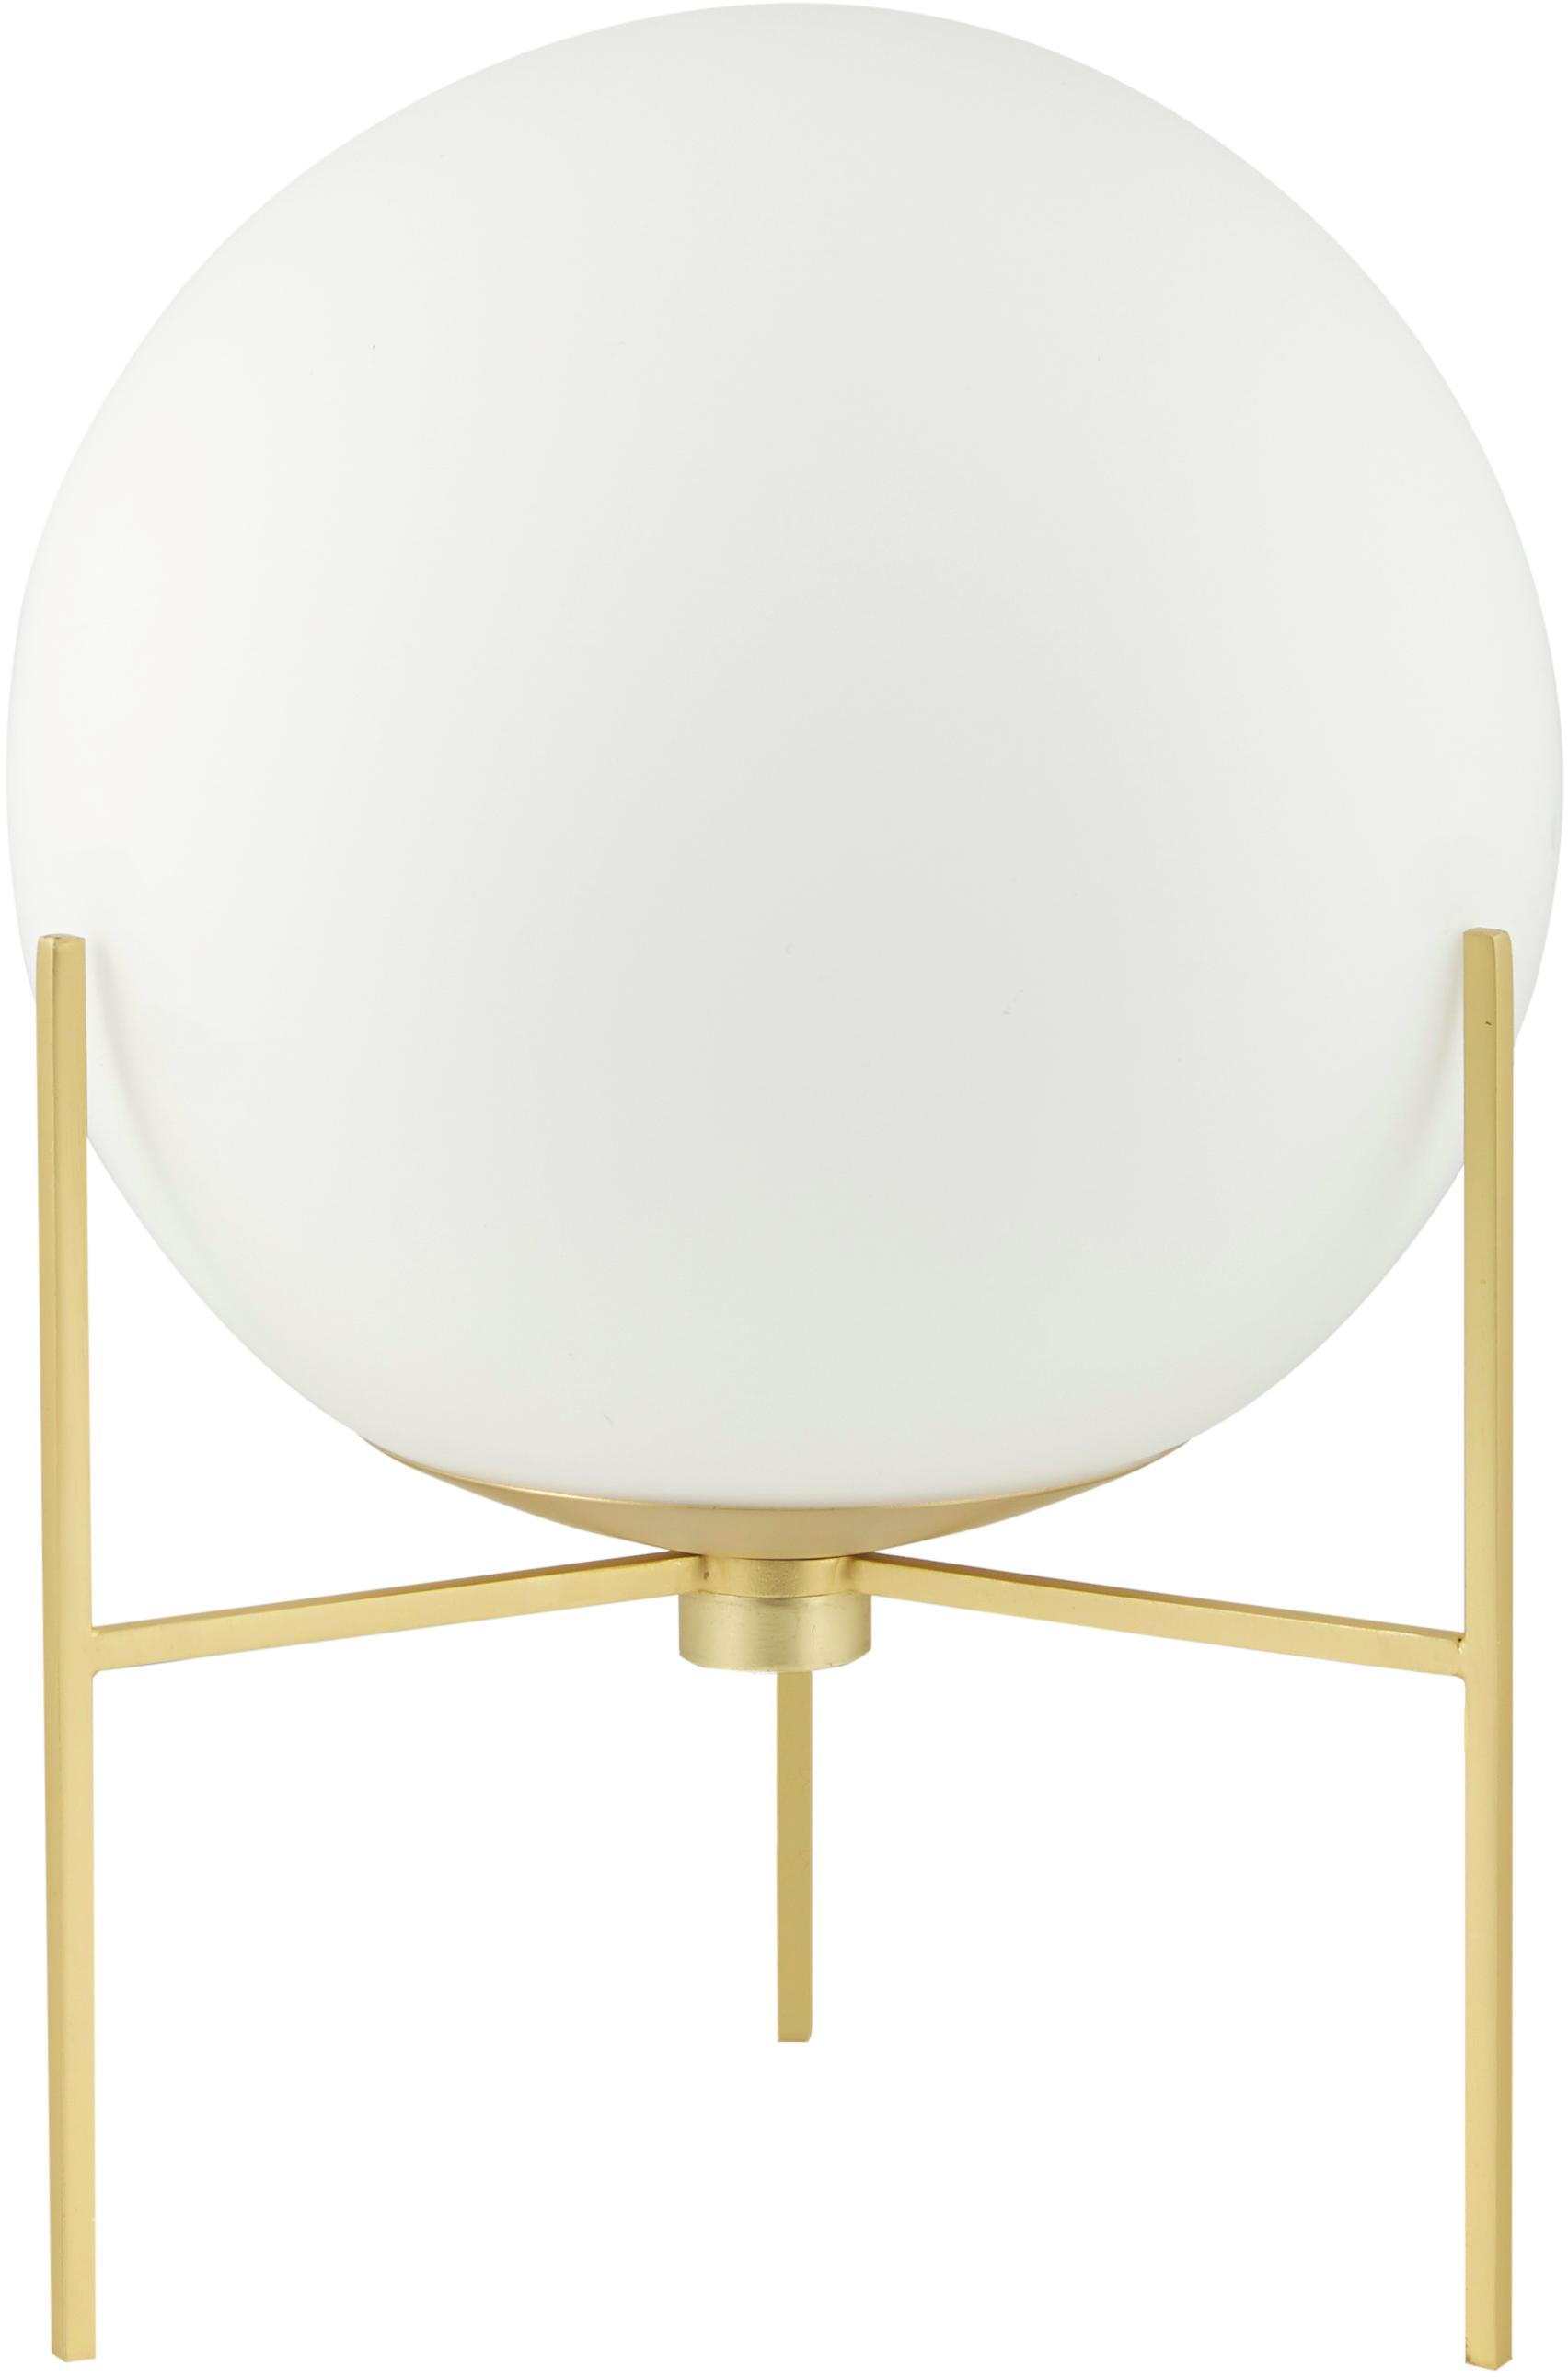 Tischlampe Alton aus Opalglas, Lampenfuß: Messing, Lampenschirm: Opalglas, Messing, Weiß, Ø 20 x H 29 cm